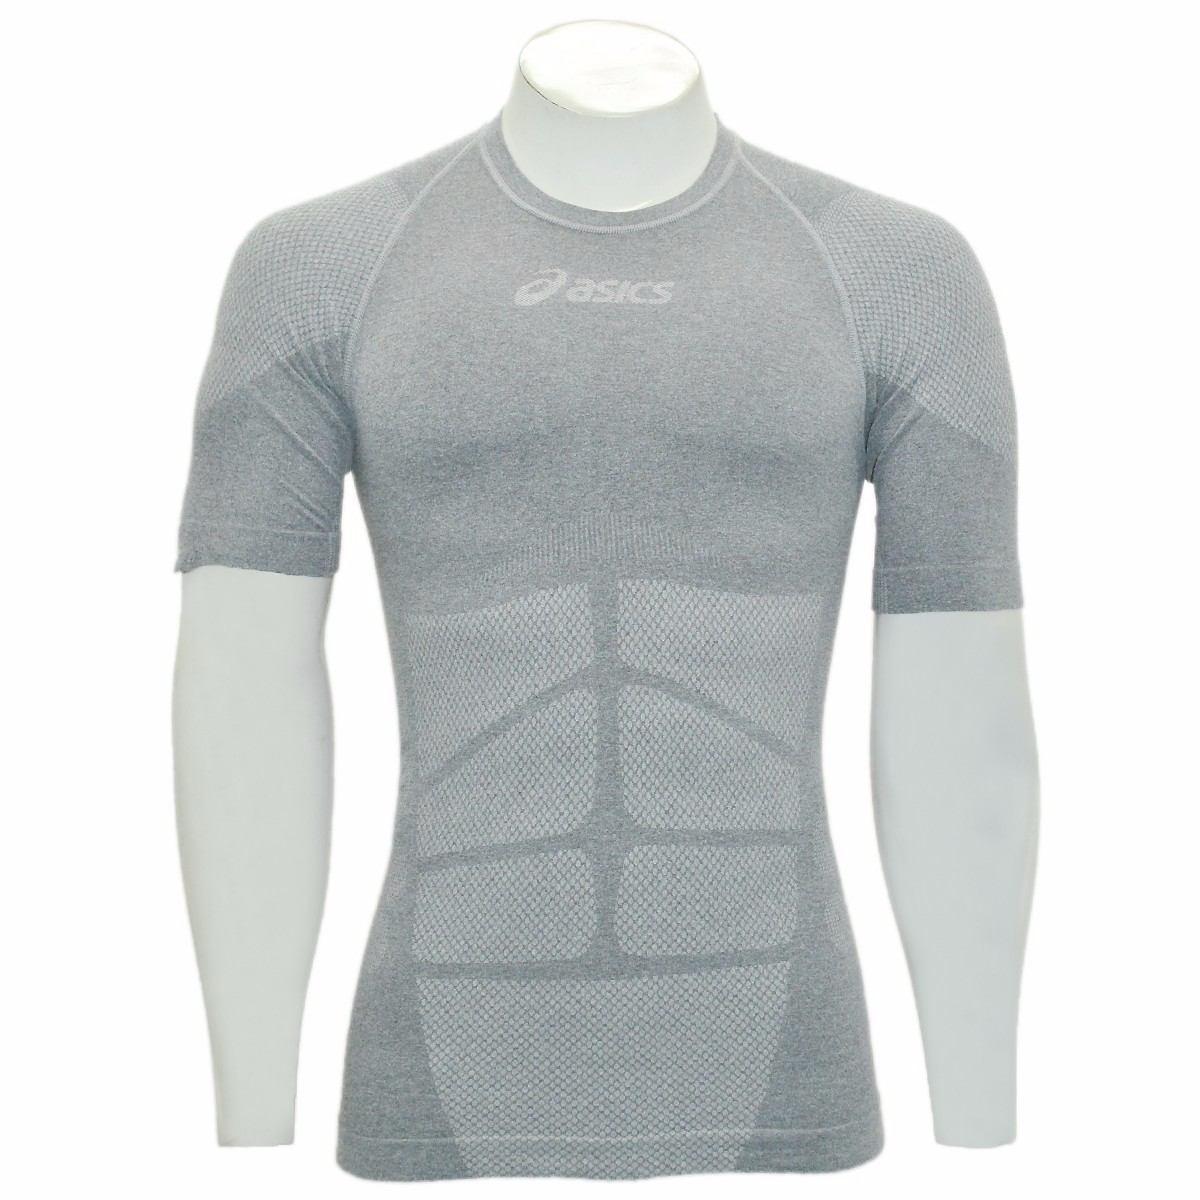 75b0acaf9d camisa térmica asics manga curta 2ª pele running frete free. Carregando  zoom.